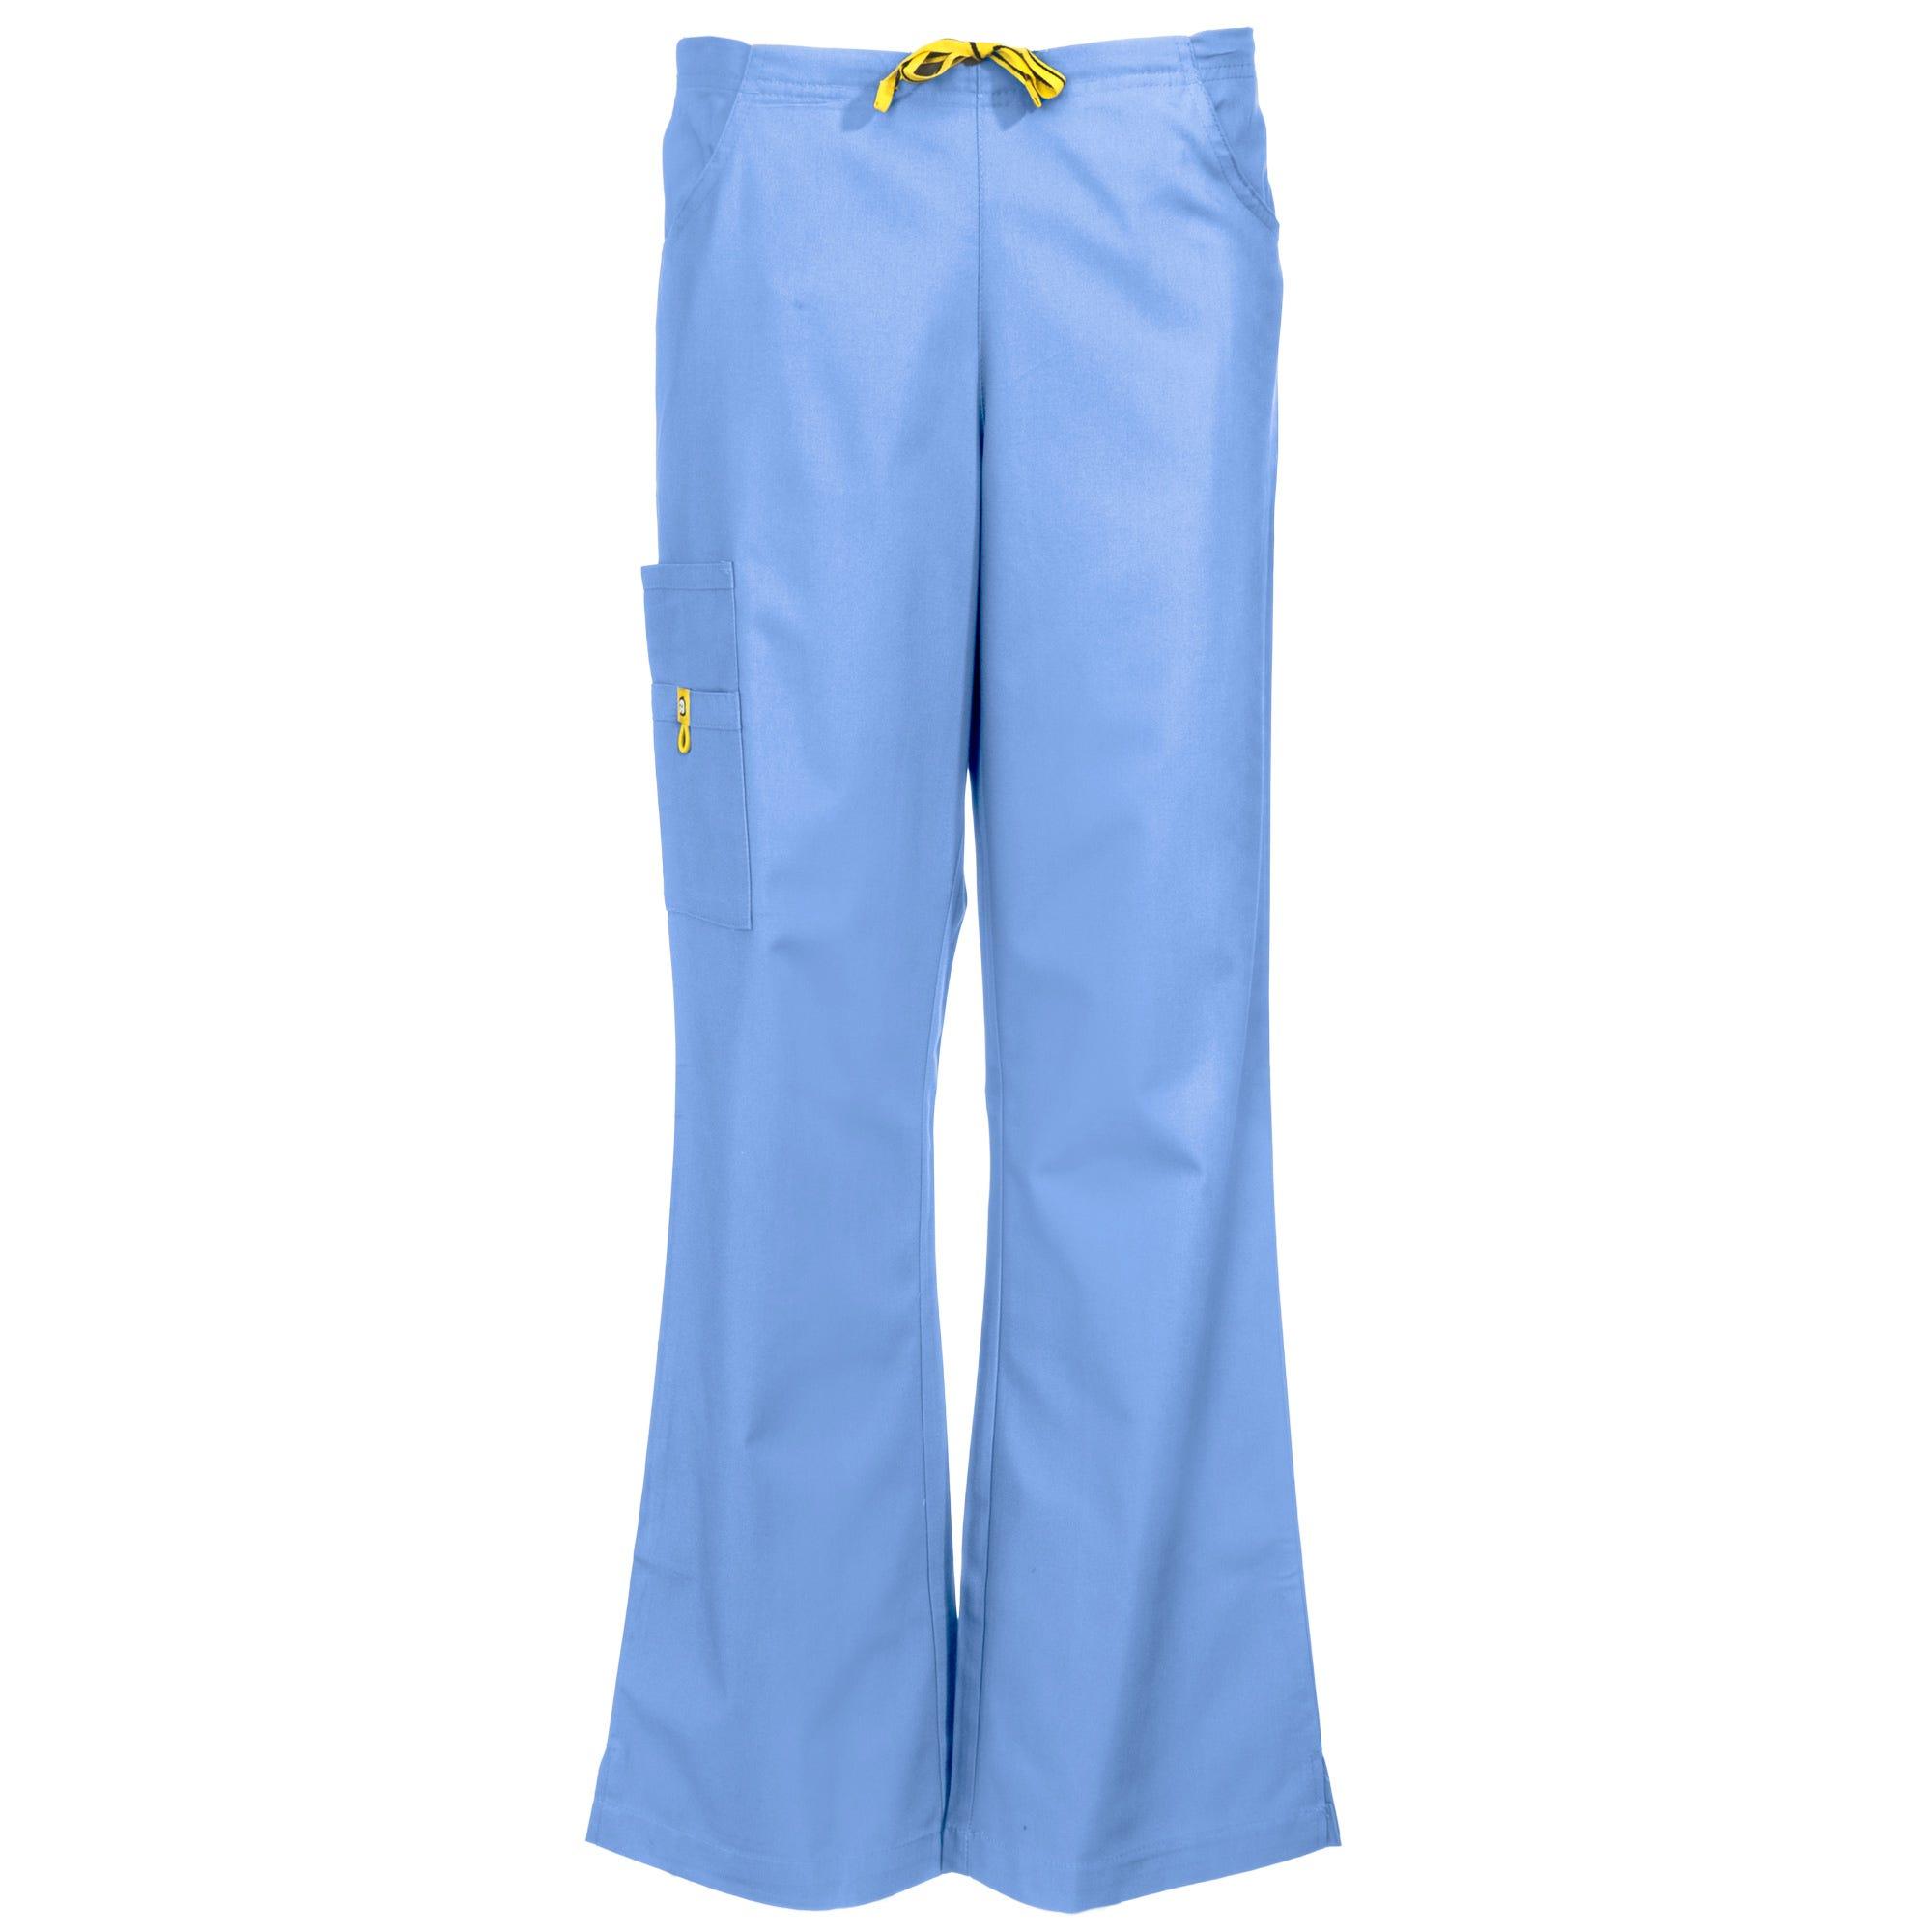 Wonderwink Women's 5026 CBL Ceil Blue Romeo Flare Leg Scrub Bottoms